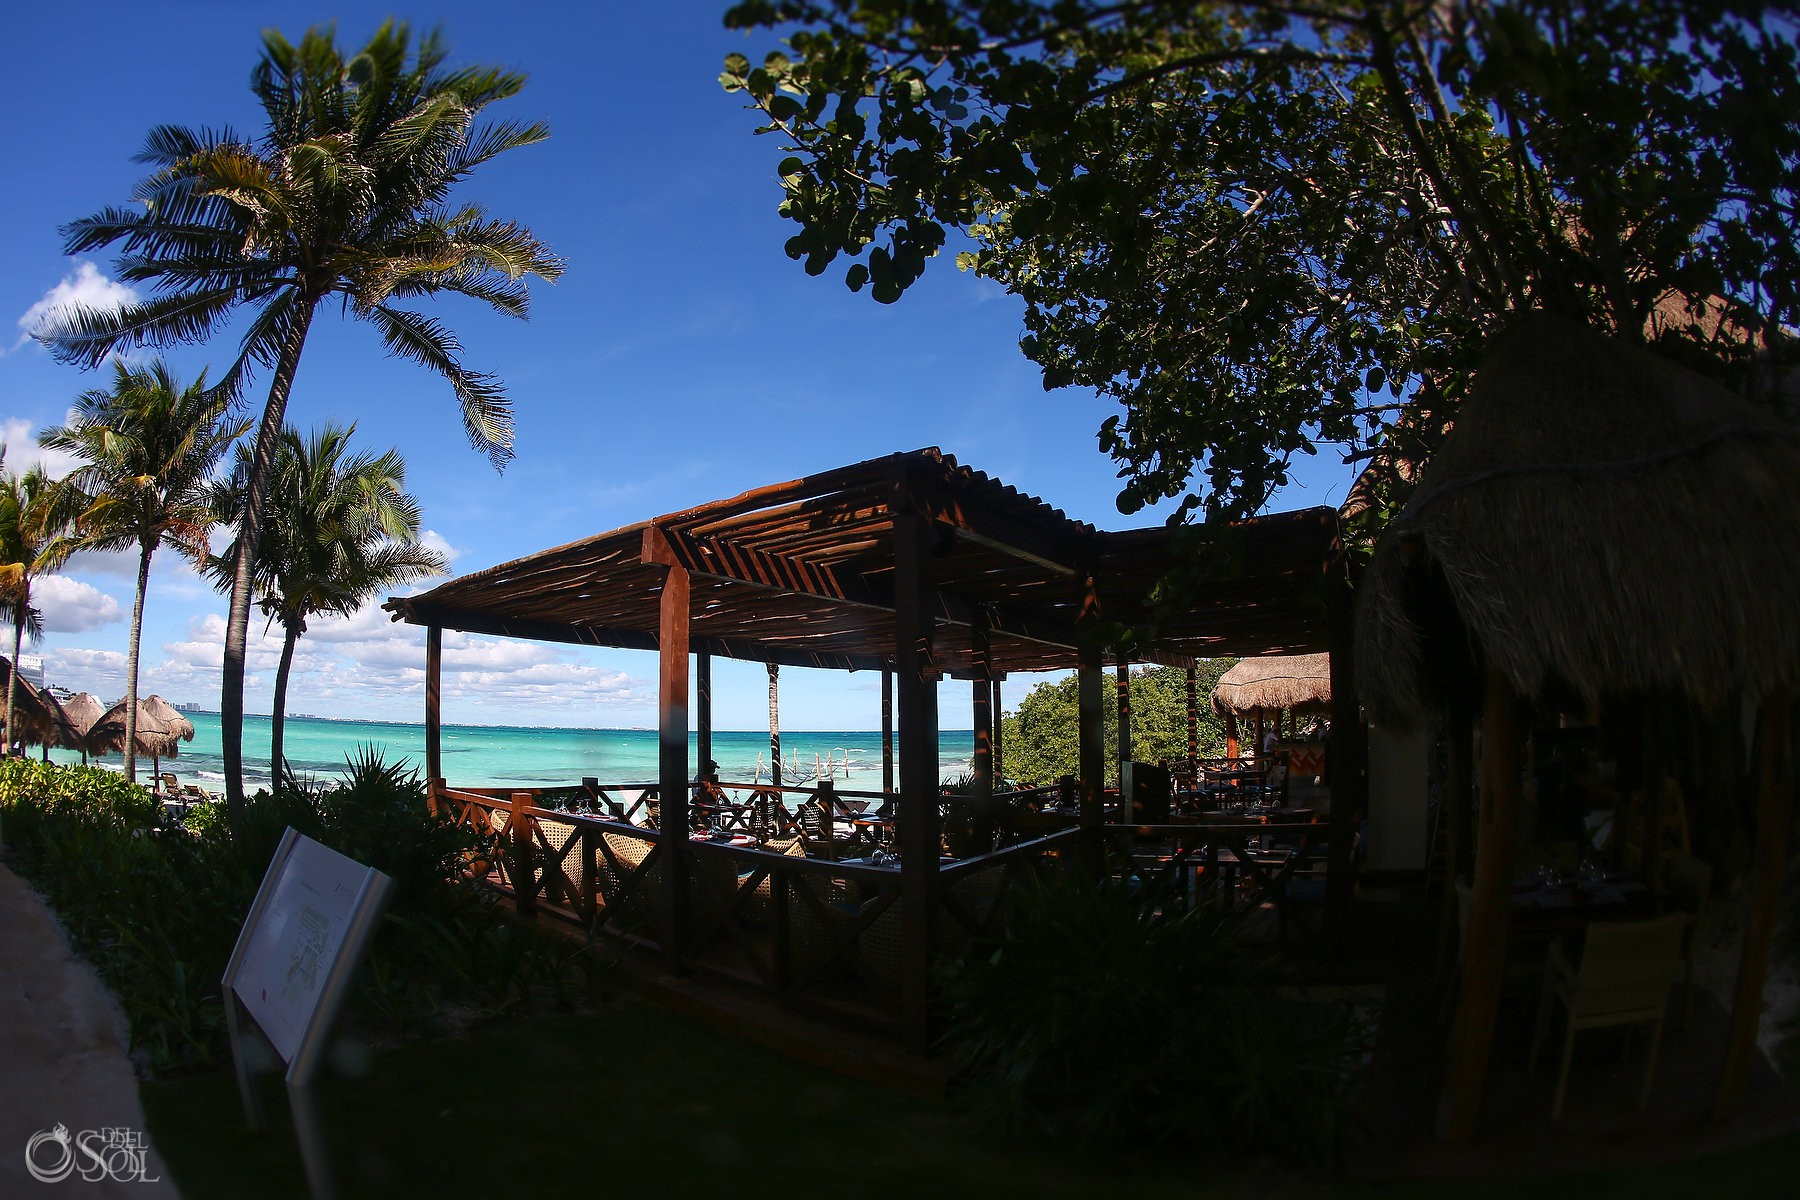 Luxury destination wedding venue Hyatt Ziva Cancun, Mexico by del sol photography